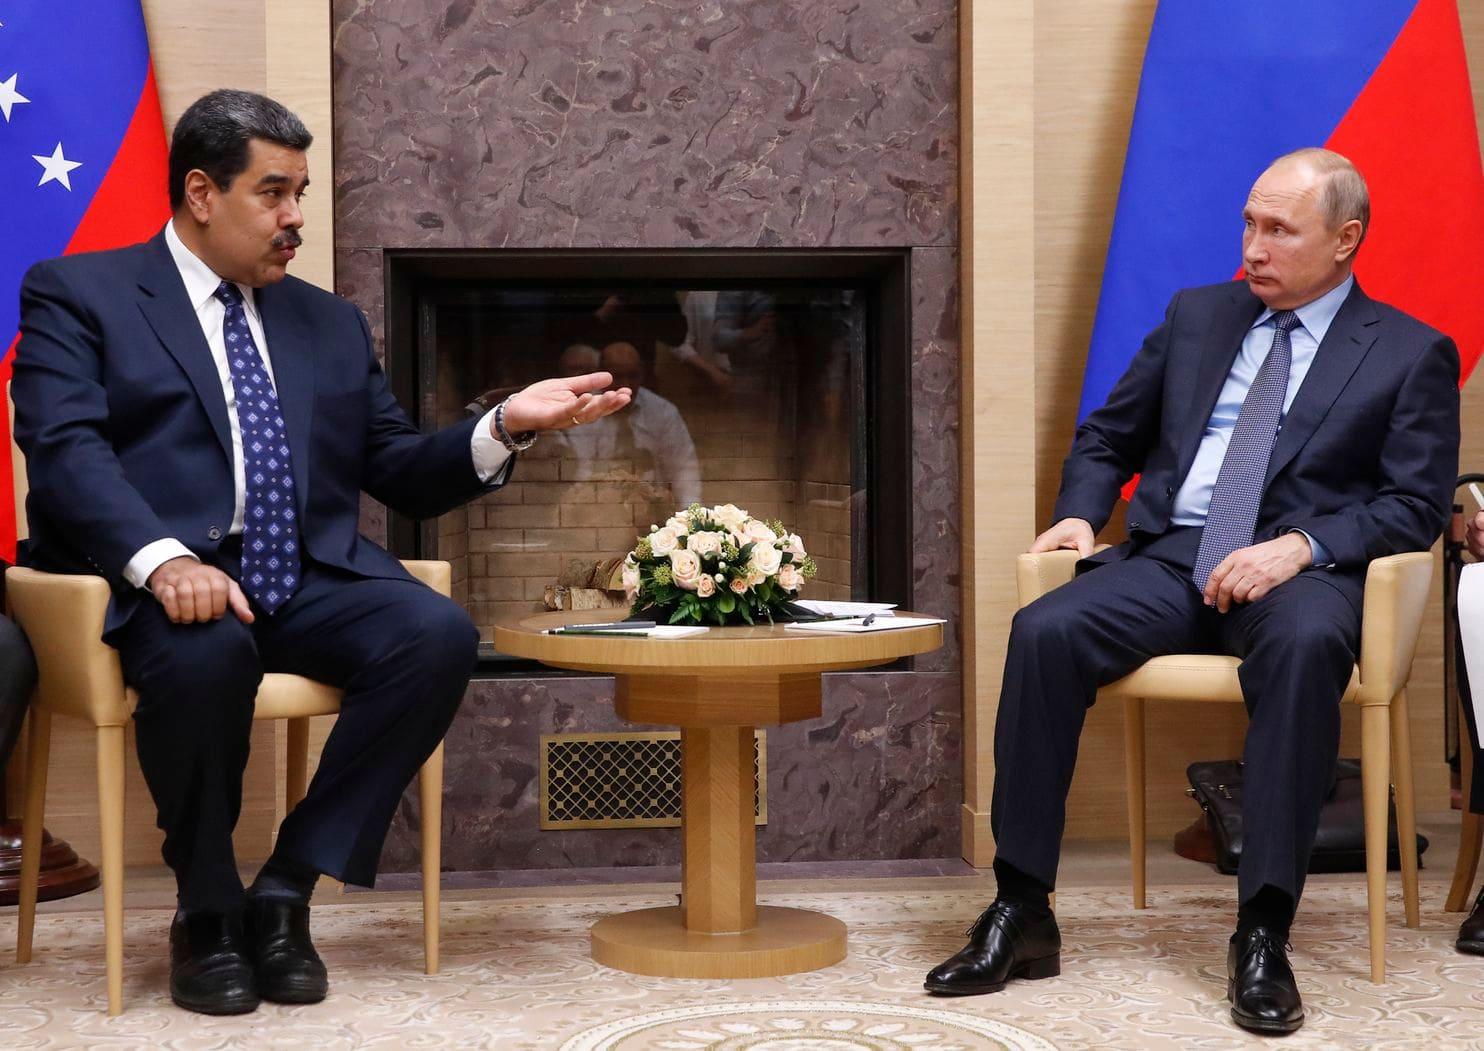 Russia says ready to mediate Venezuelan crisis